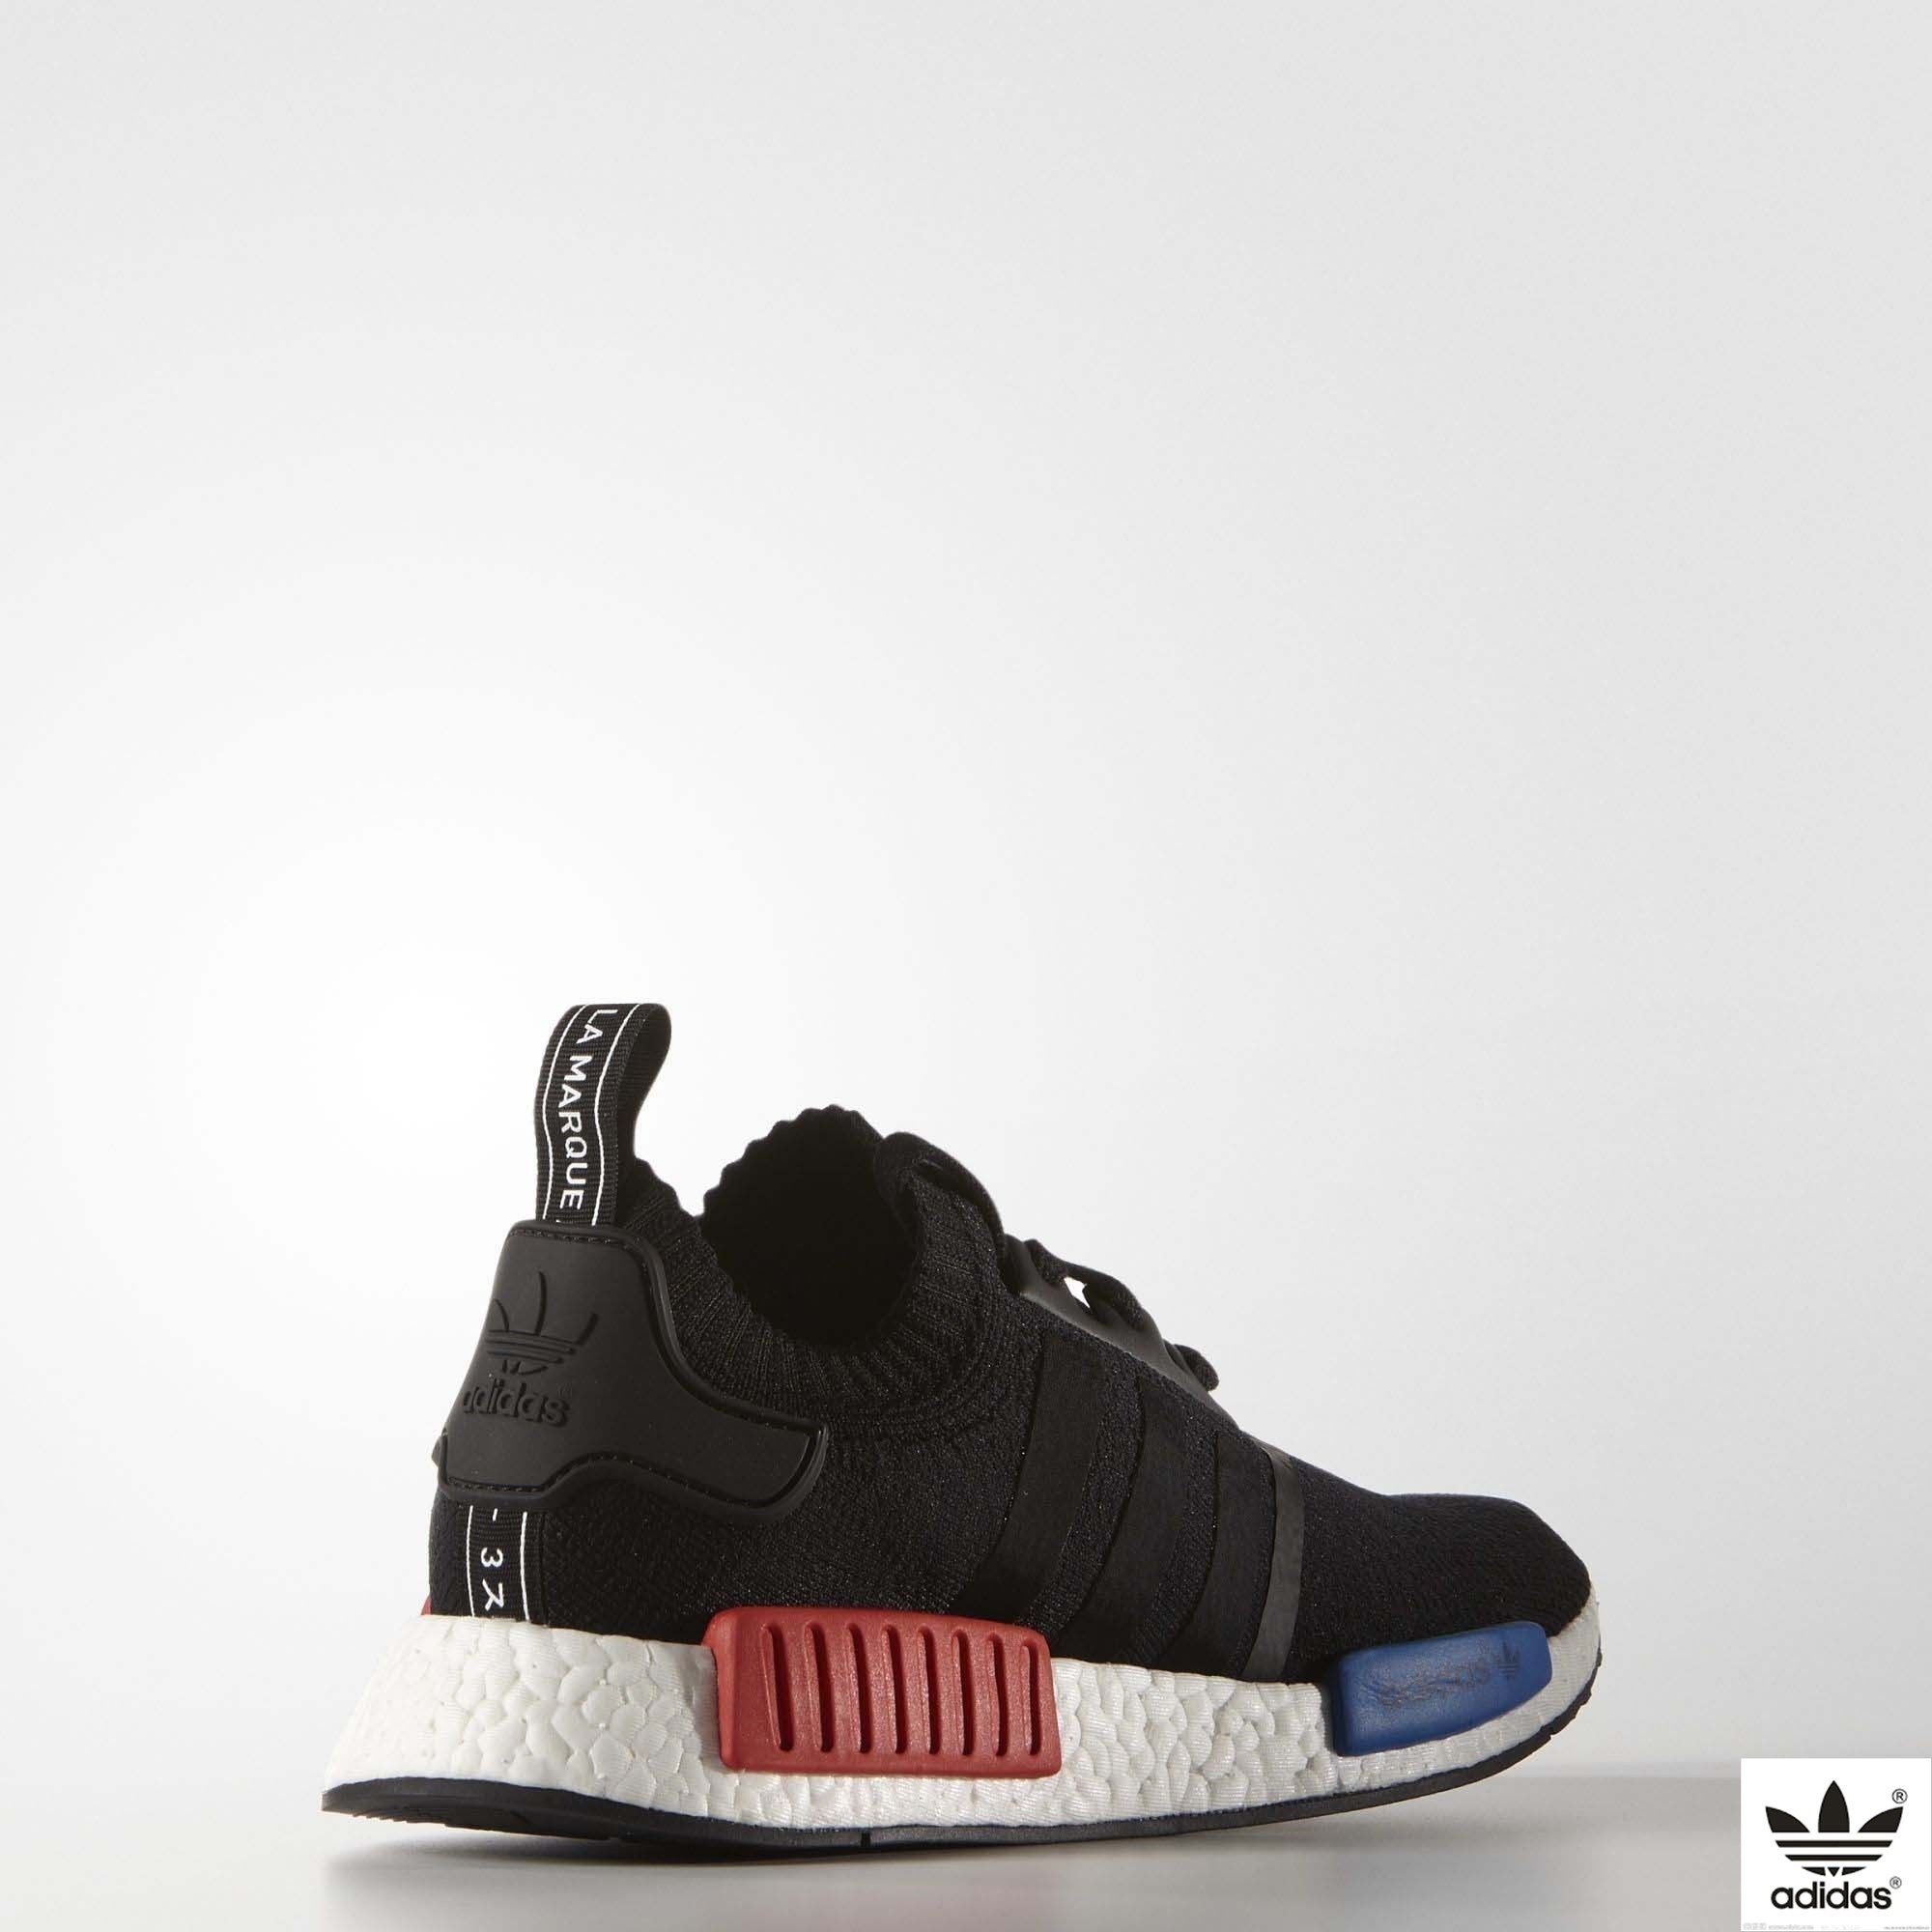 adidas Nmd R1 Prime Knit Black Black Gum Sneaker herren